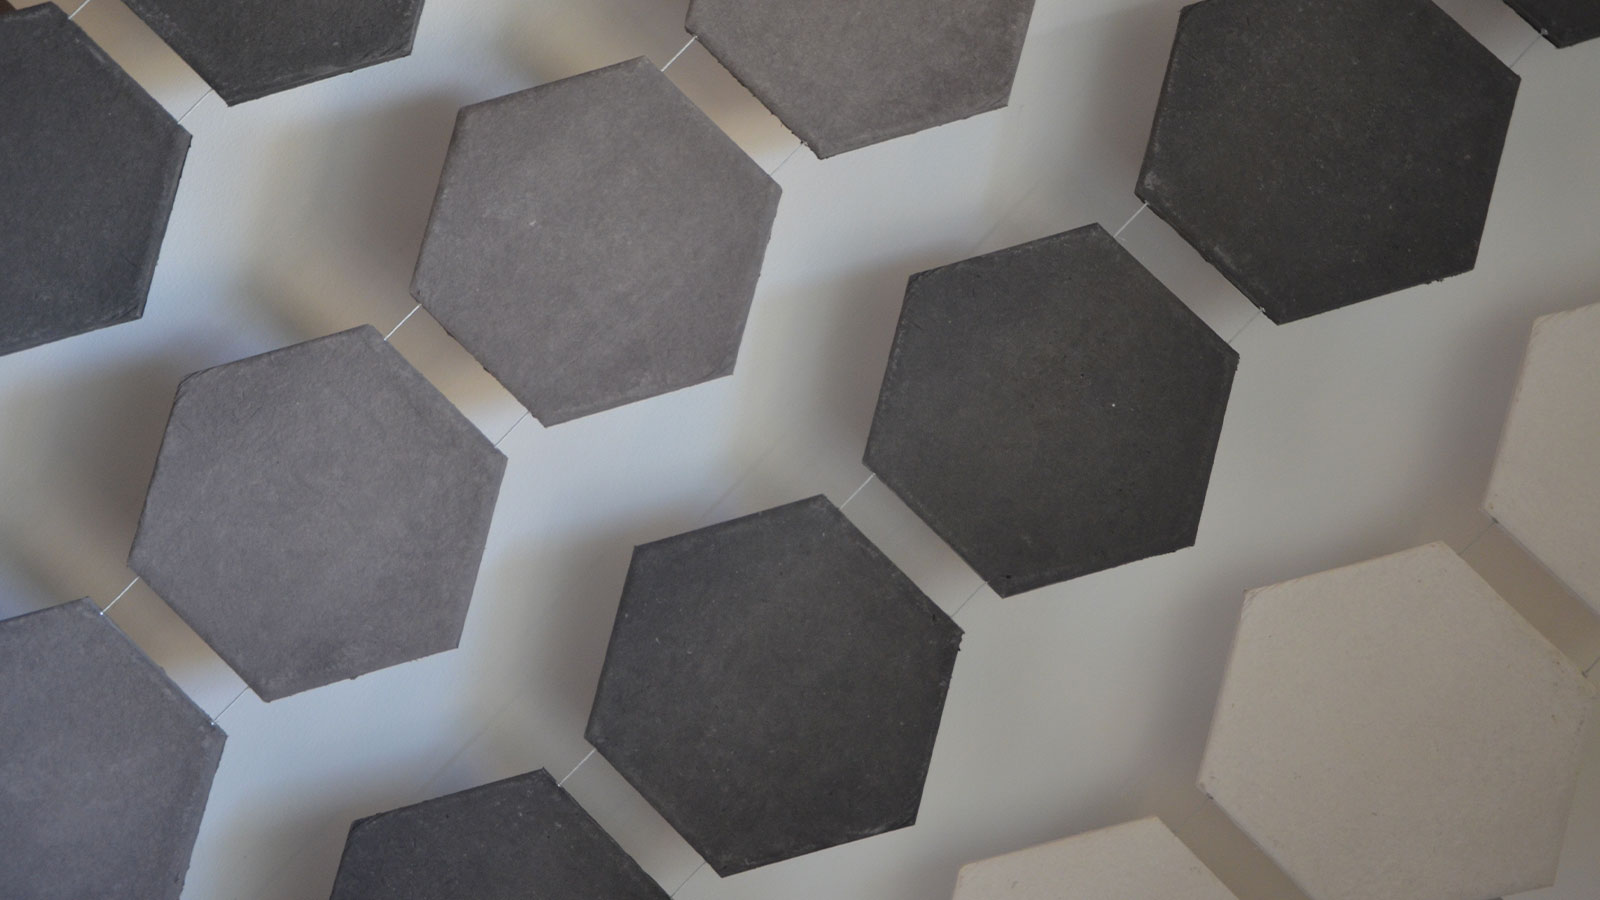 materiali_casa_around_the_shapes_2019-esagoni